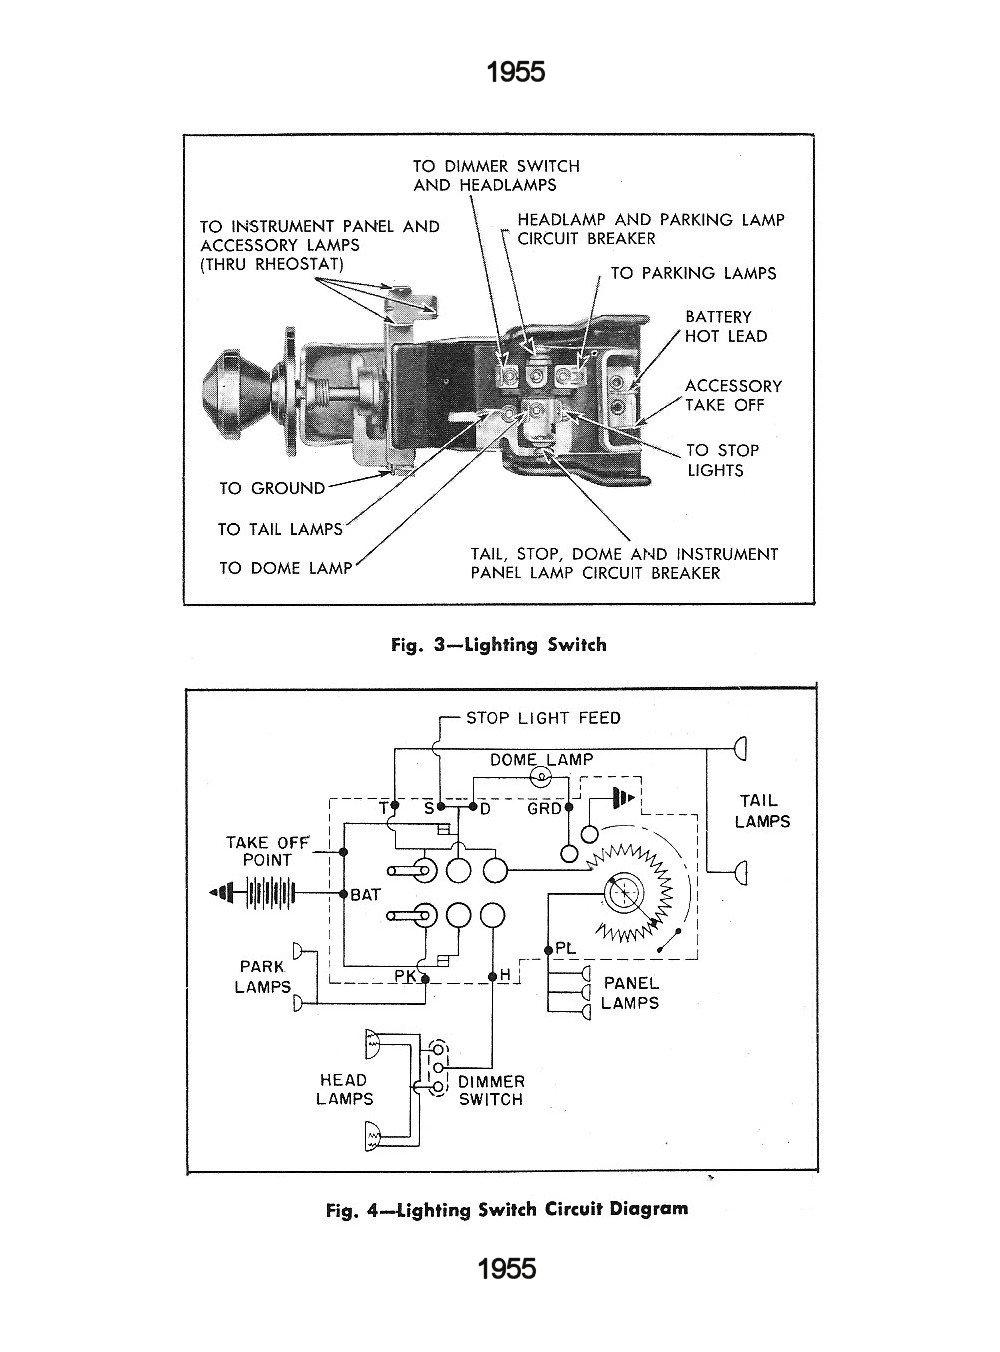 Admirable 1984 Chevy C10 Fuse Box Diagram Basic Electronics Wiring Diagram Wiring Cloud Ittabisraaidewilluminateatxorg